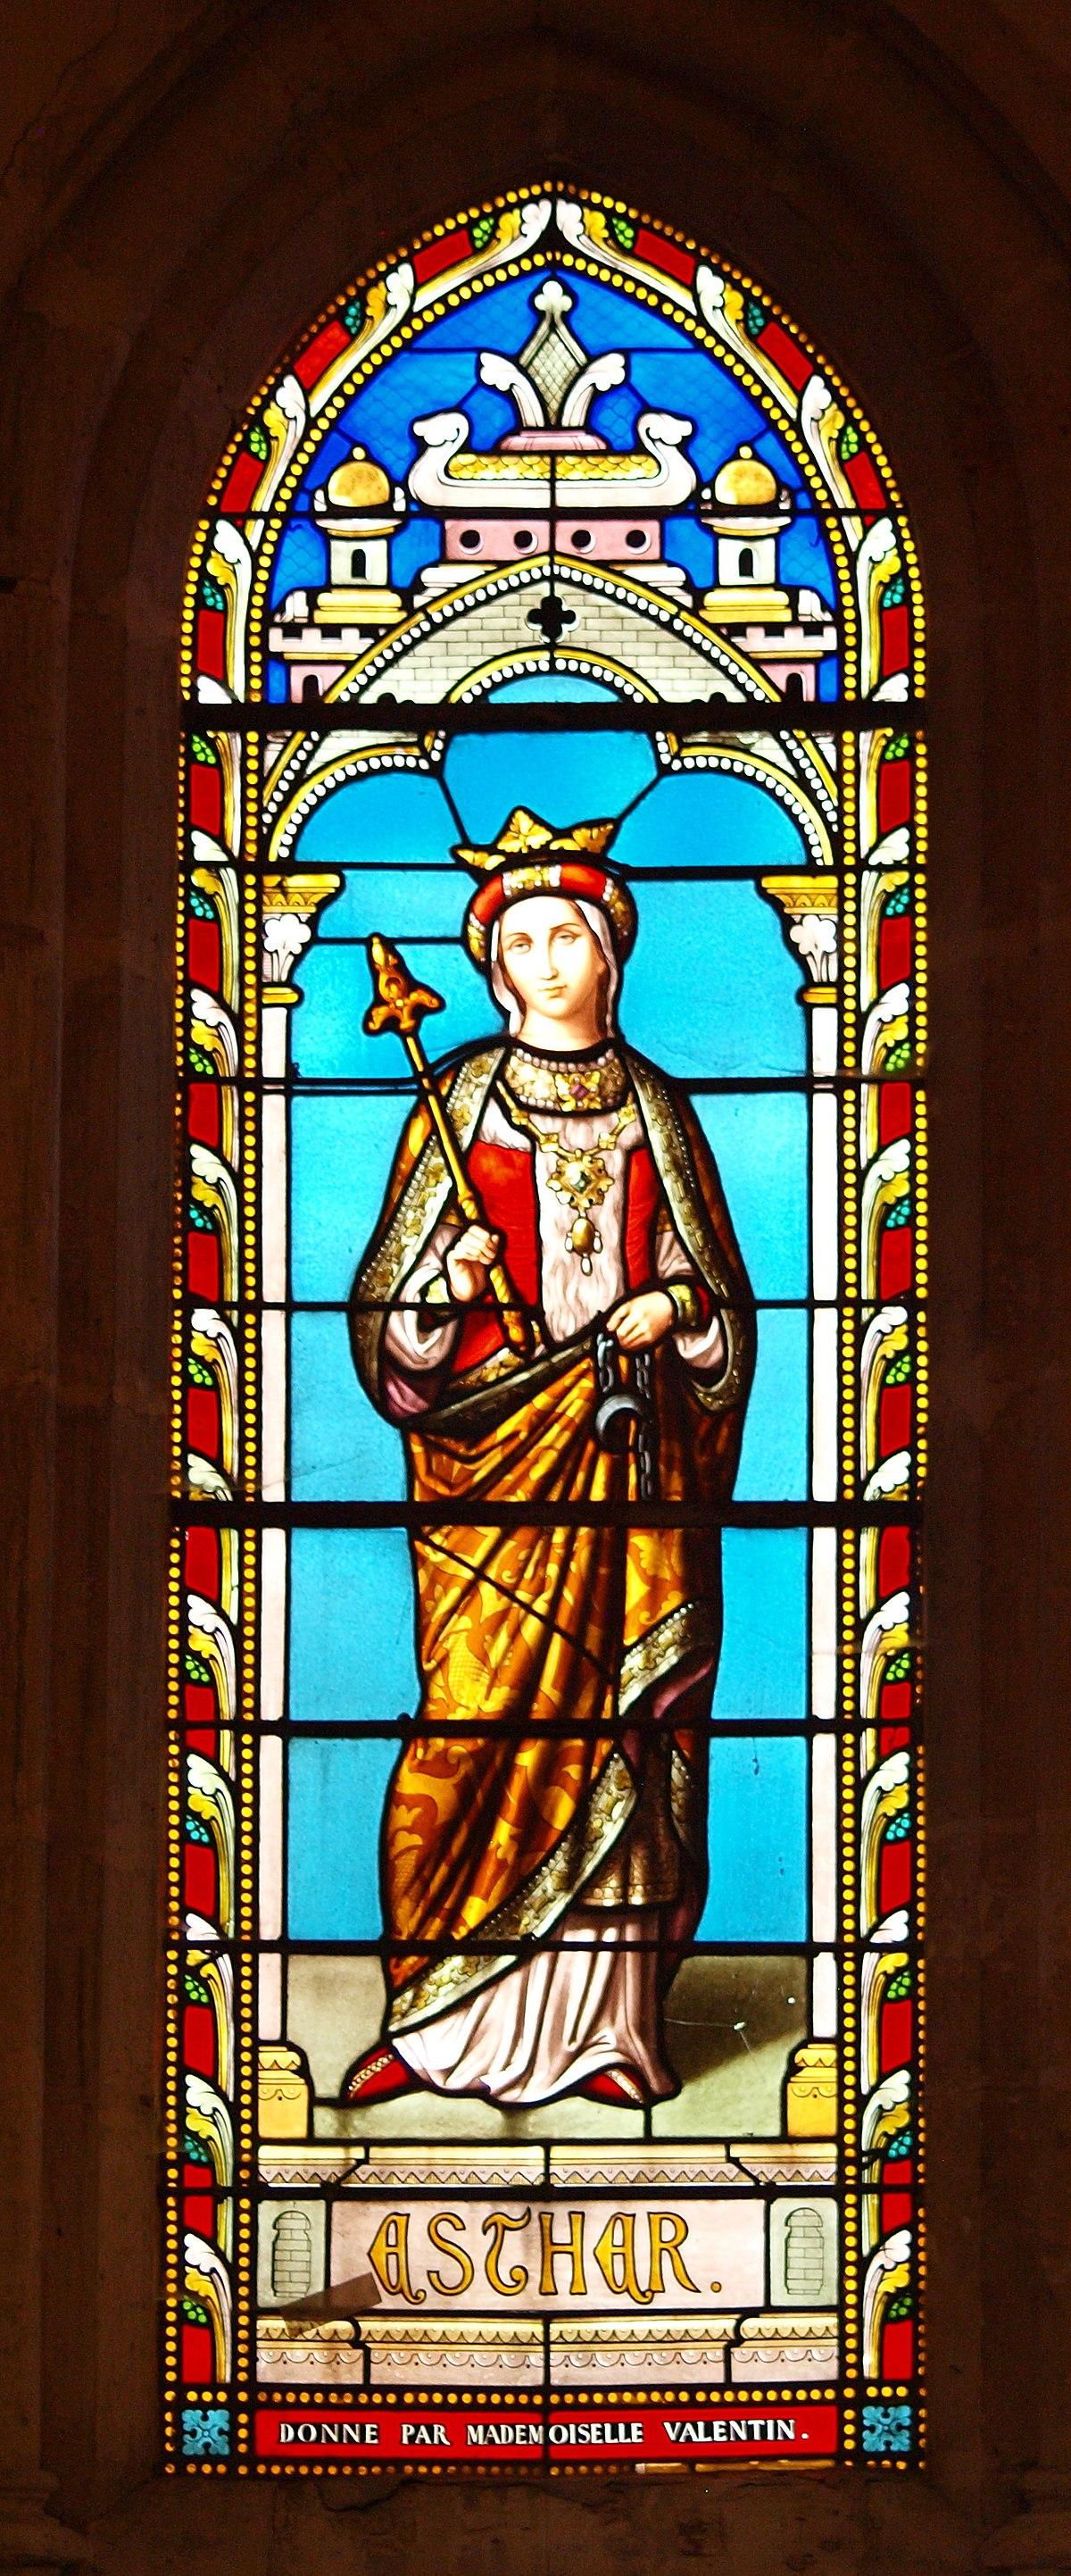 File:Neuvizy-FR-08-église-vitrail-14 jpg - Wikimedia Commons